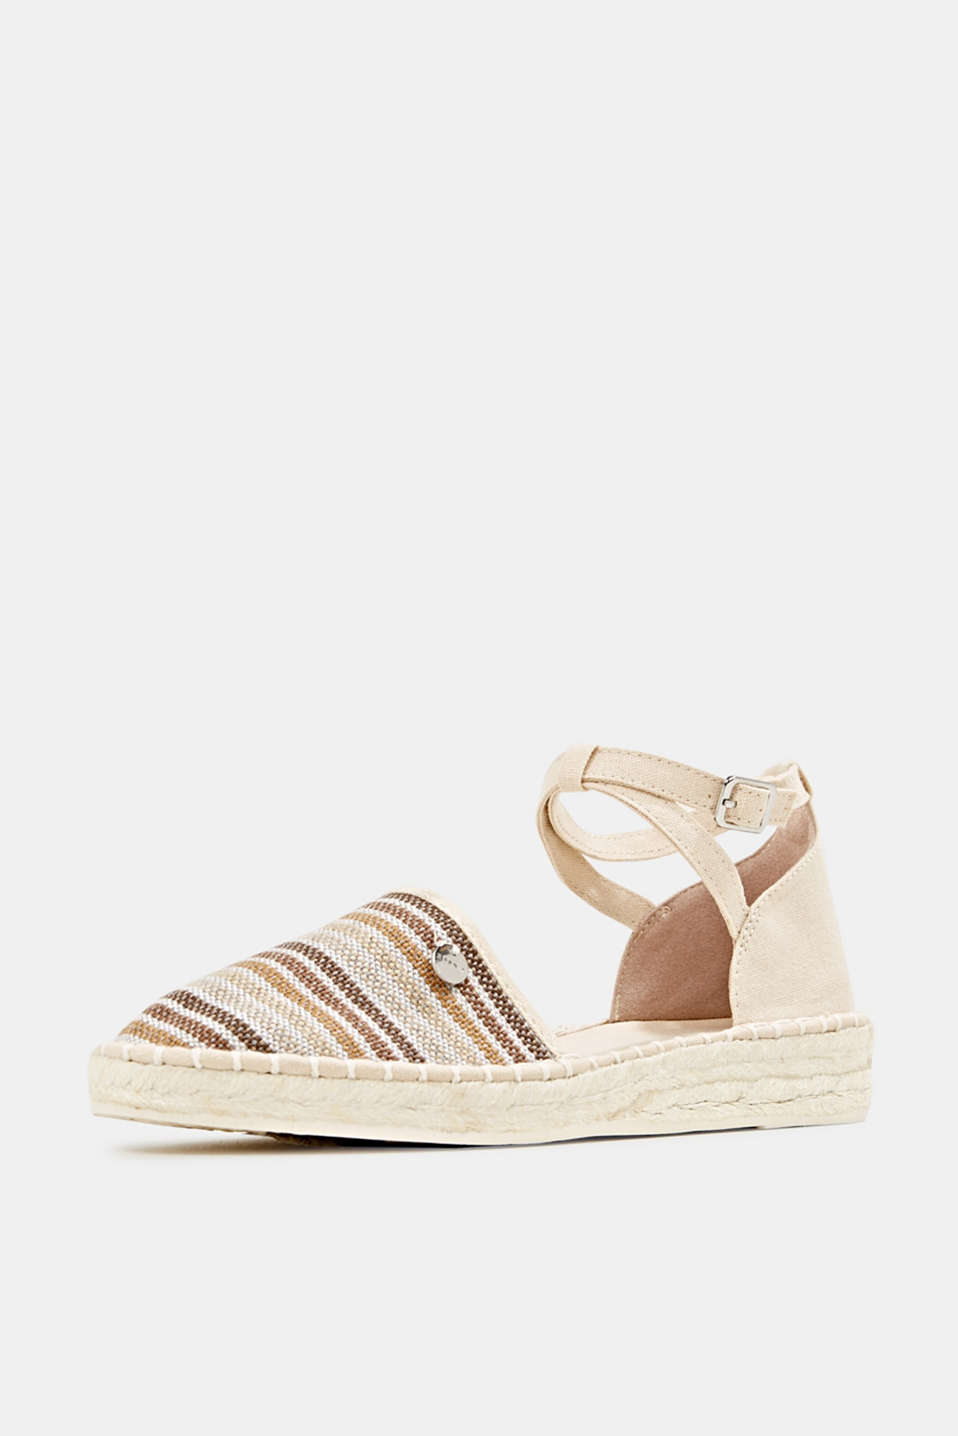 Espadrille sandals with stripes, CREAM BEIGE, detail image number 2